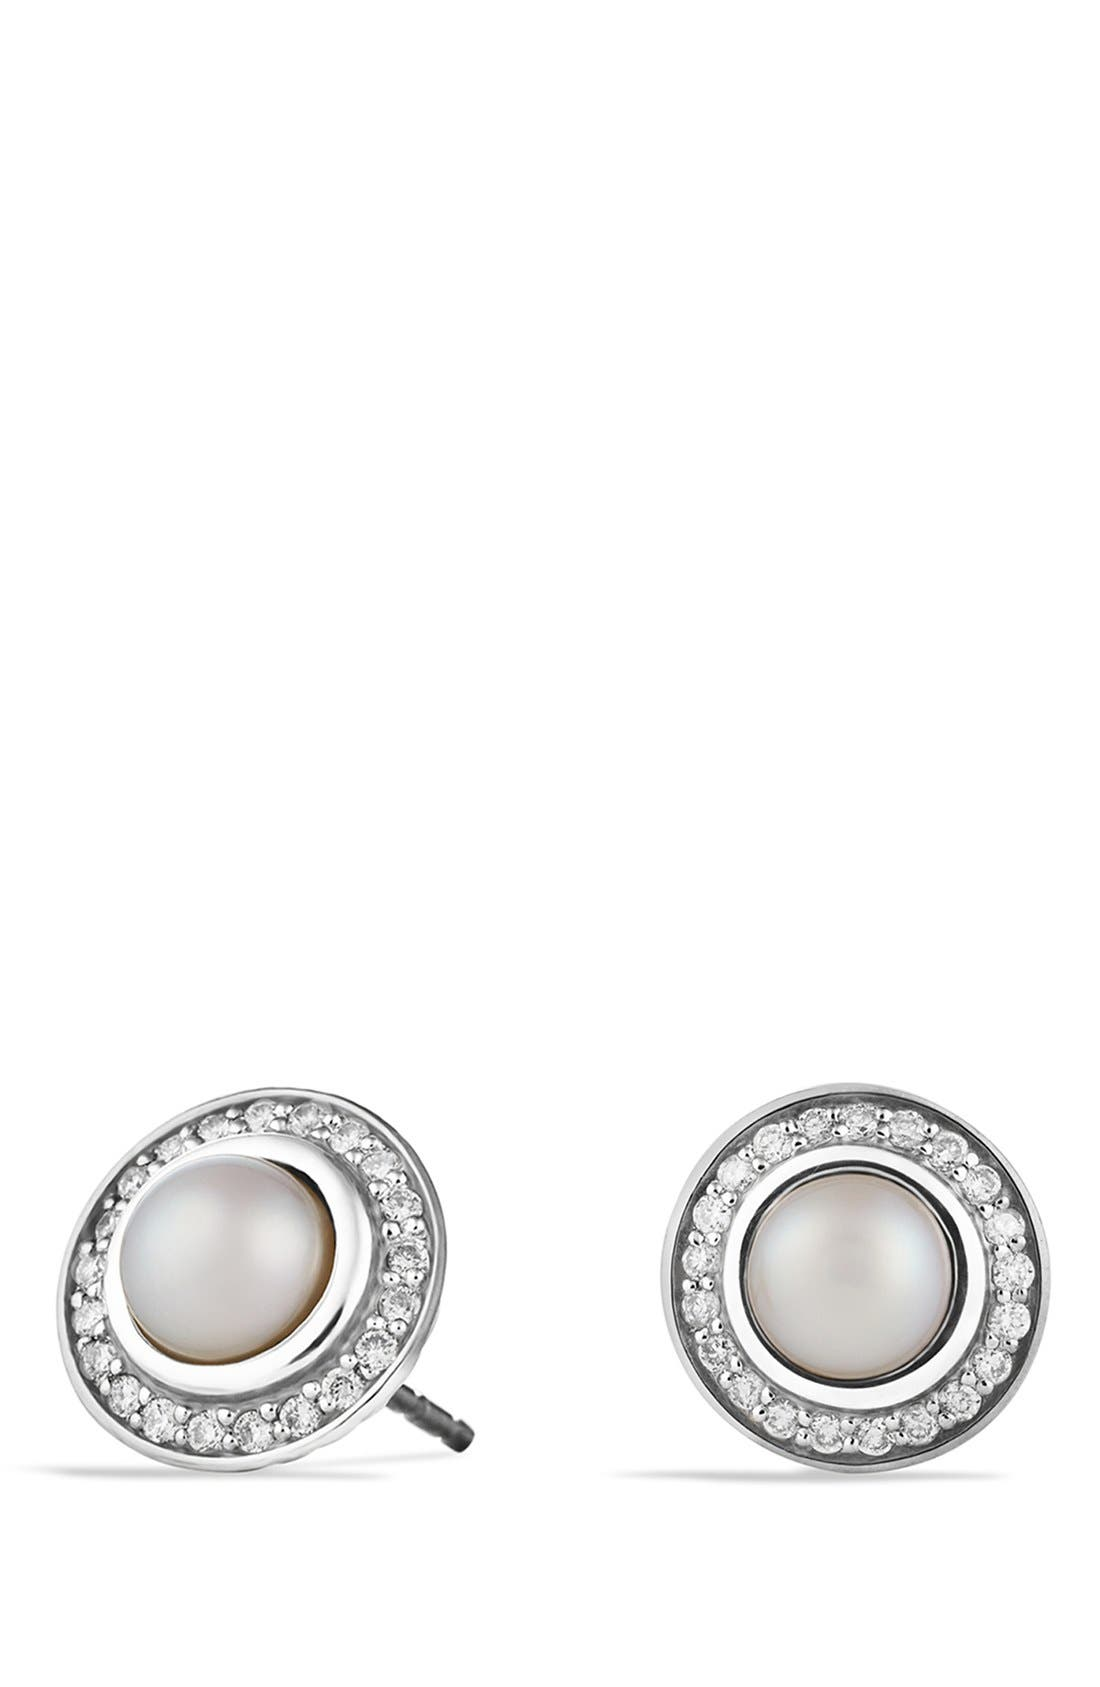 'Cerise' Mini Earrings with Semiprecious Stone & Diamonds,                             Main thumbnail 1, color,                             101